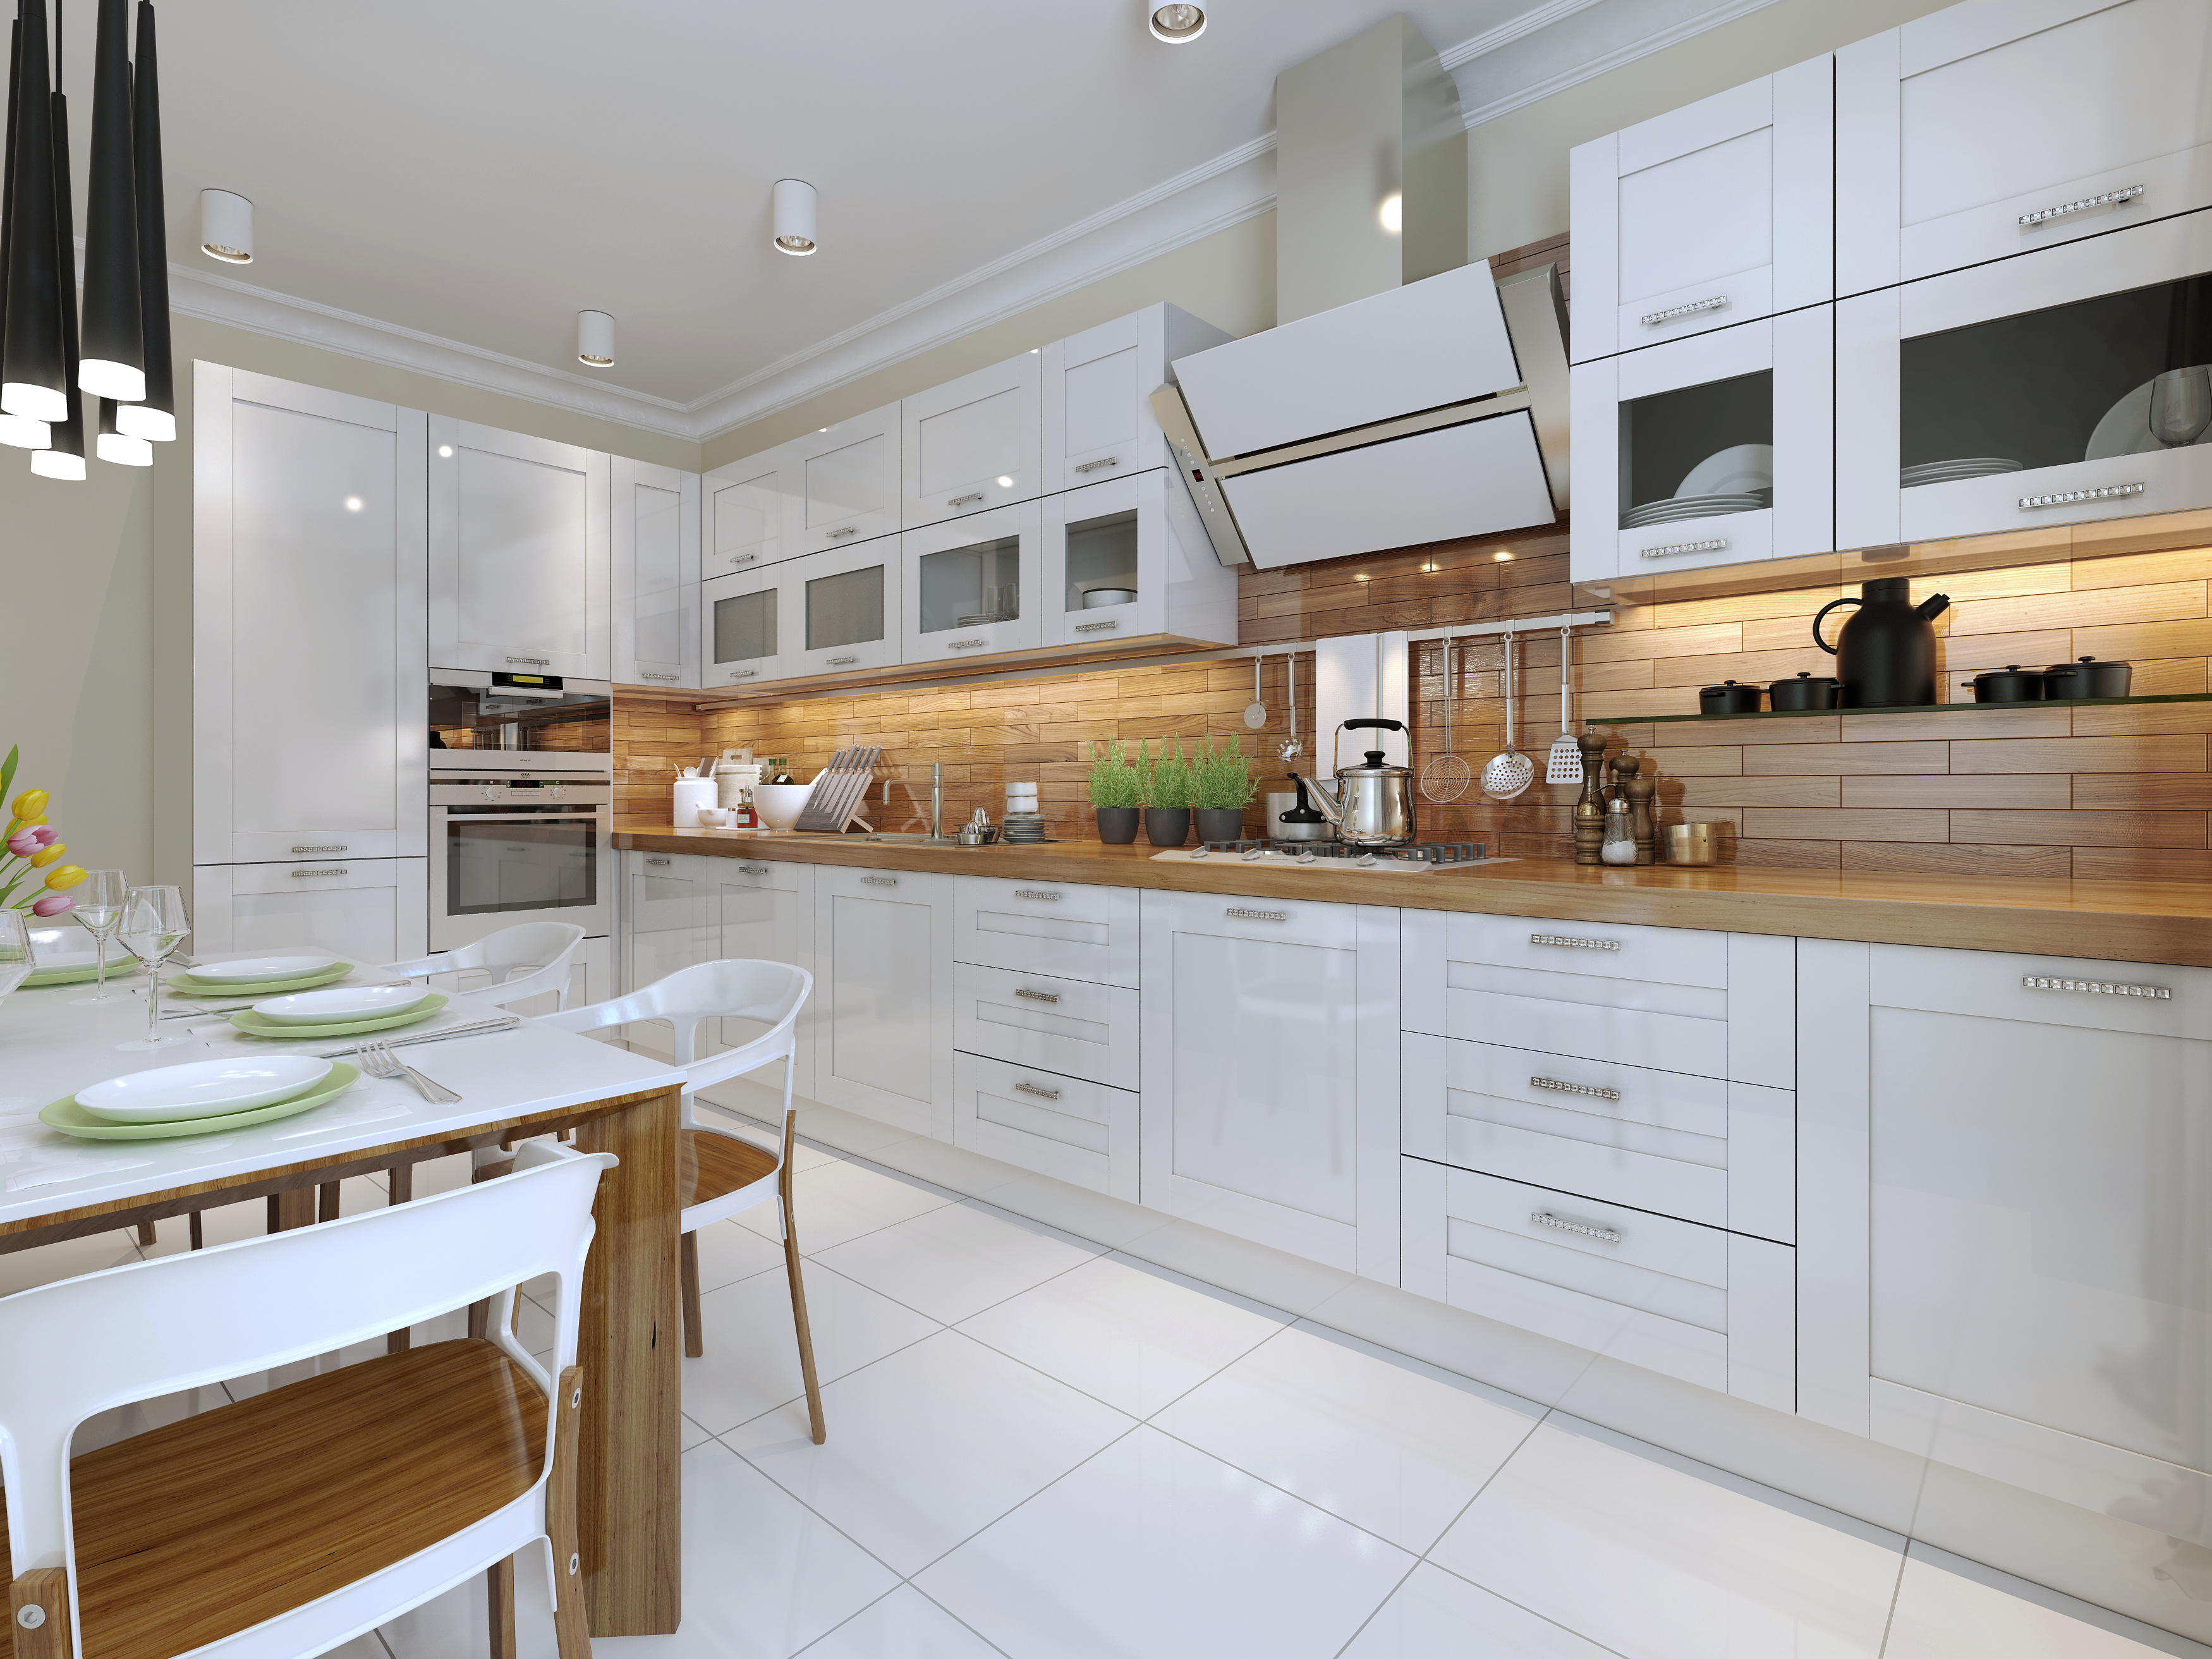 Magnificent German Country Kitchen Design 600 x 652 · 71 kB · jpeg